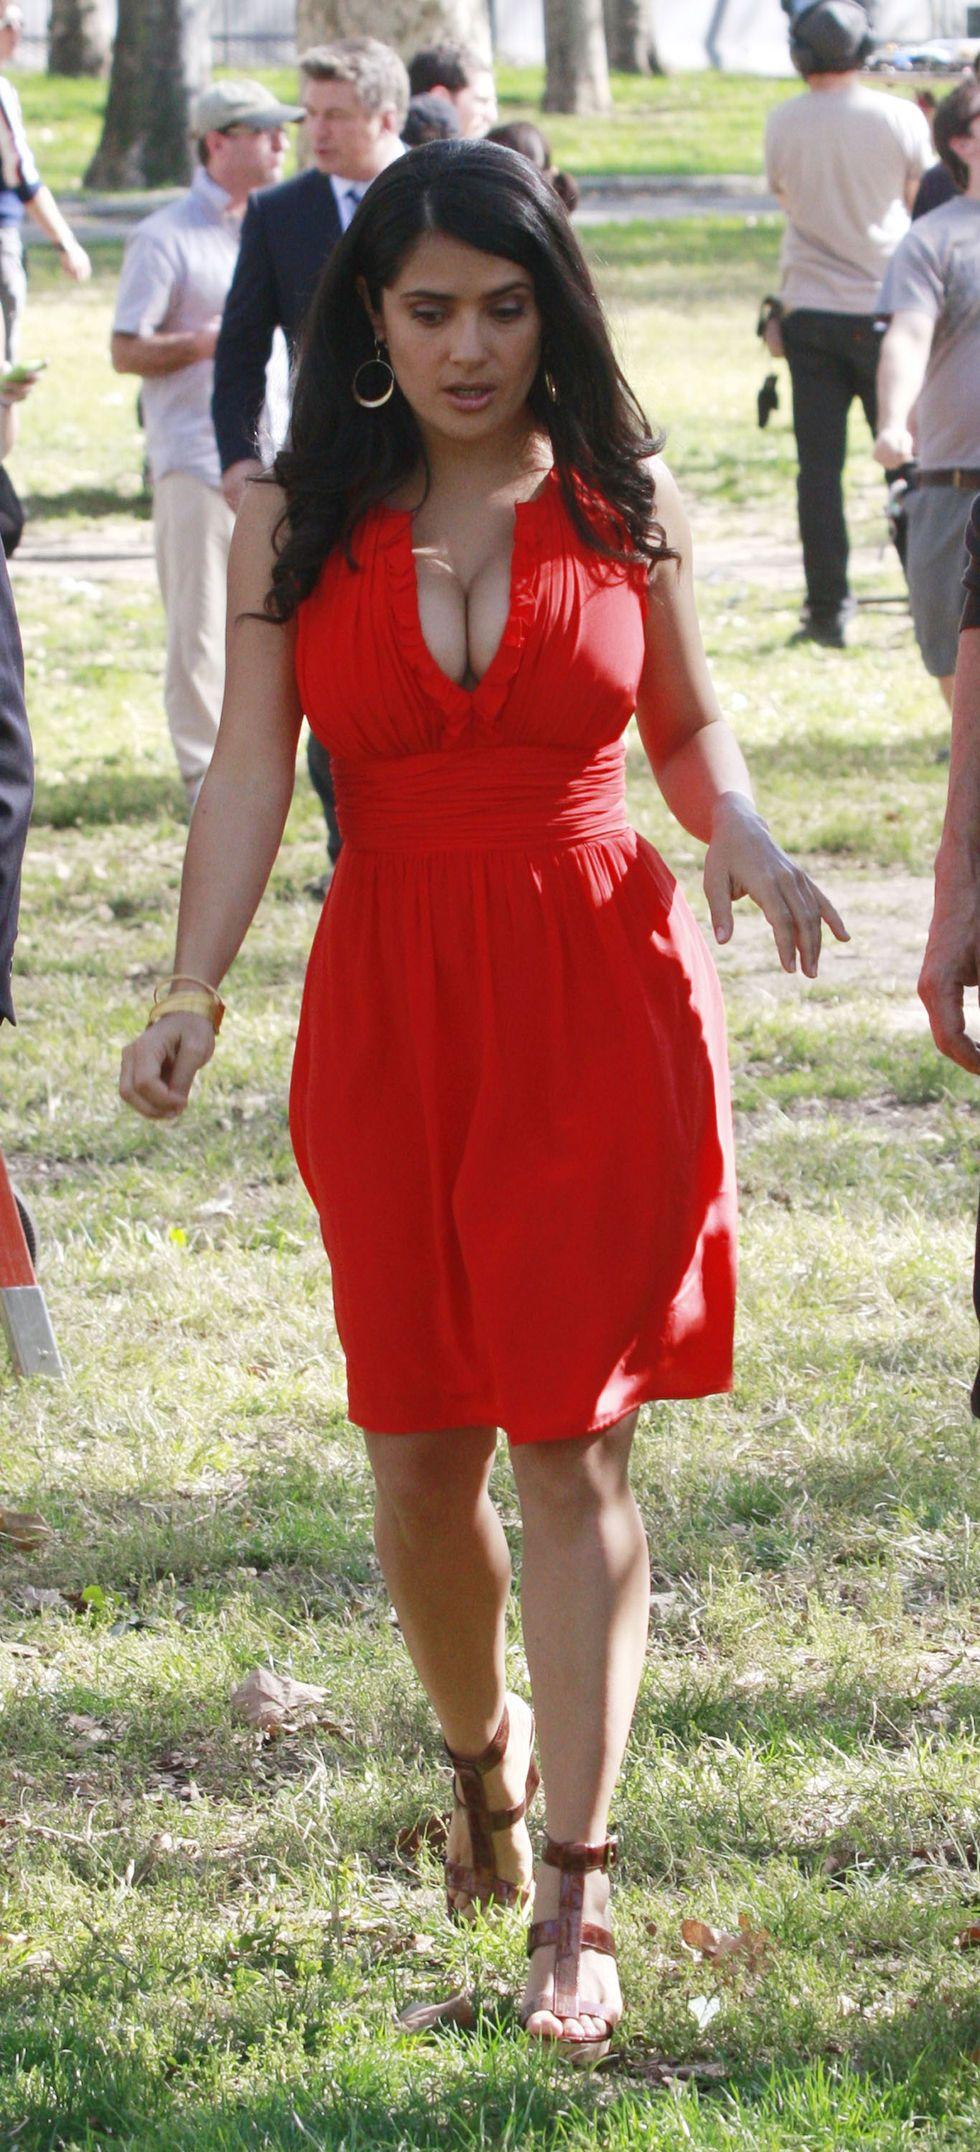 Cleavage Nicole Schott nude (67 photos), Pussy, Sideboobs, Twitter, butt 2006